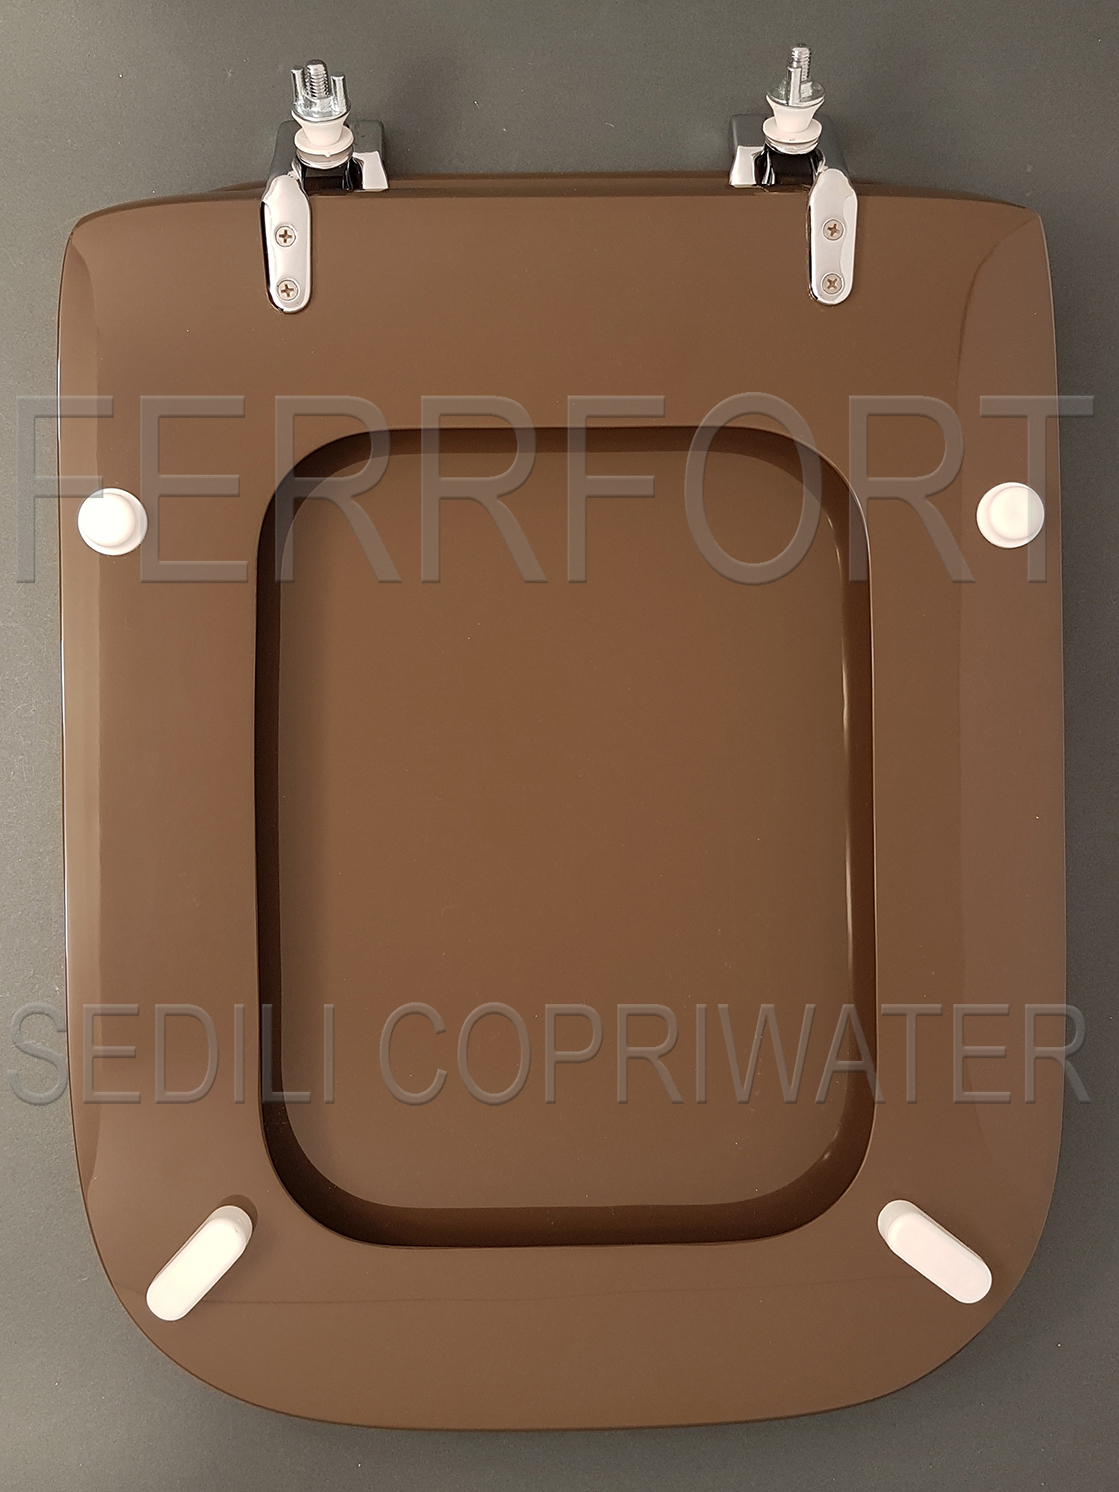 Sedile copriwater conca ideal standard castoro for Copriwater ideal standard